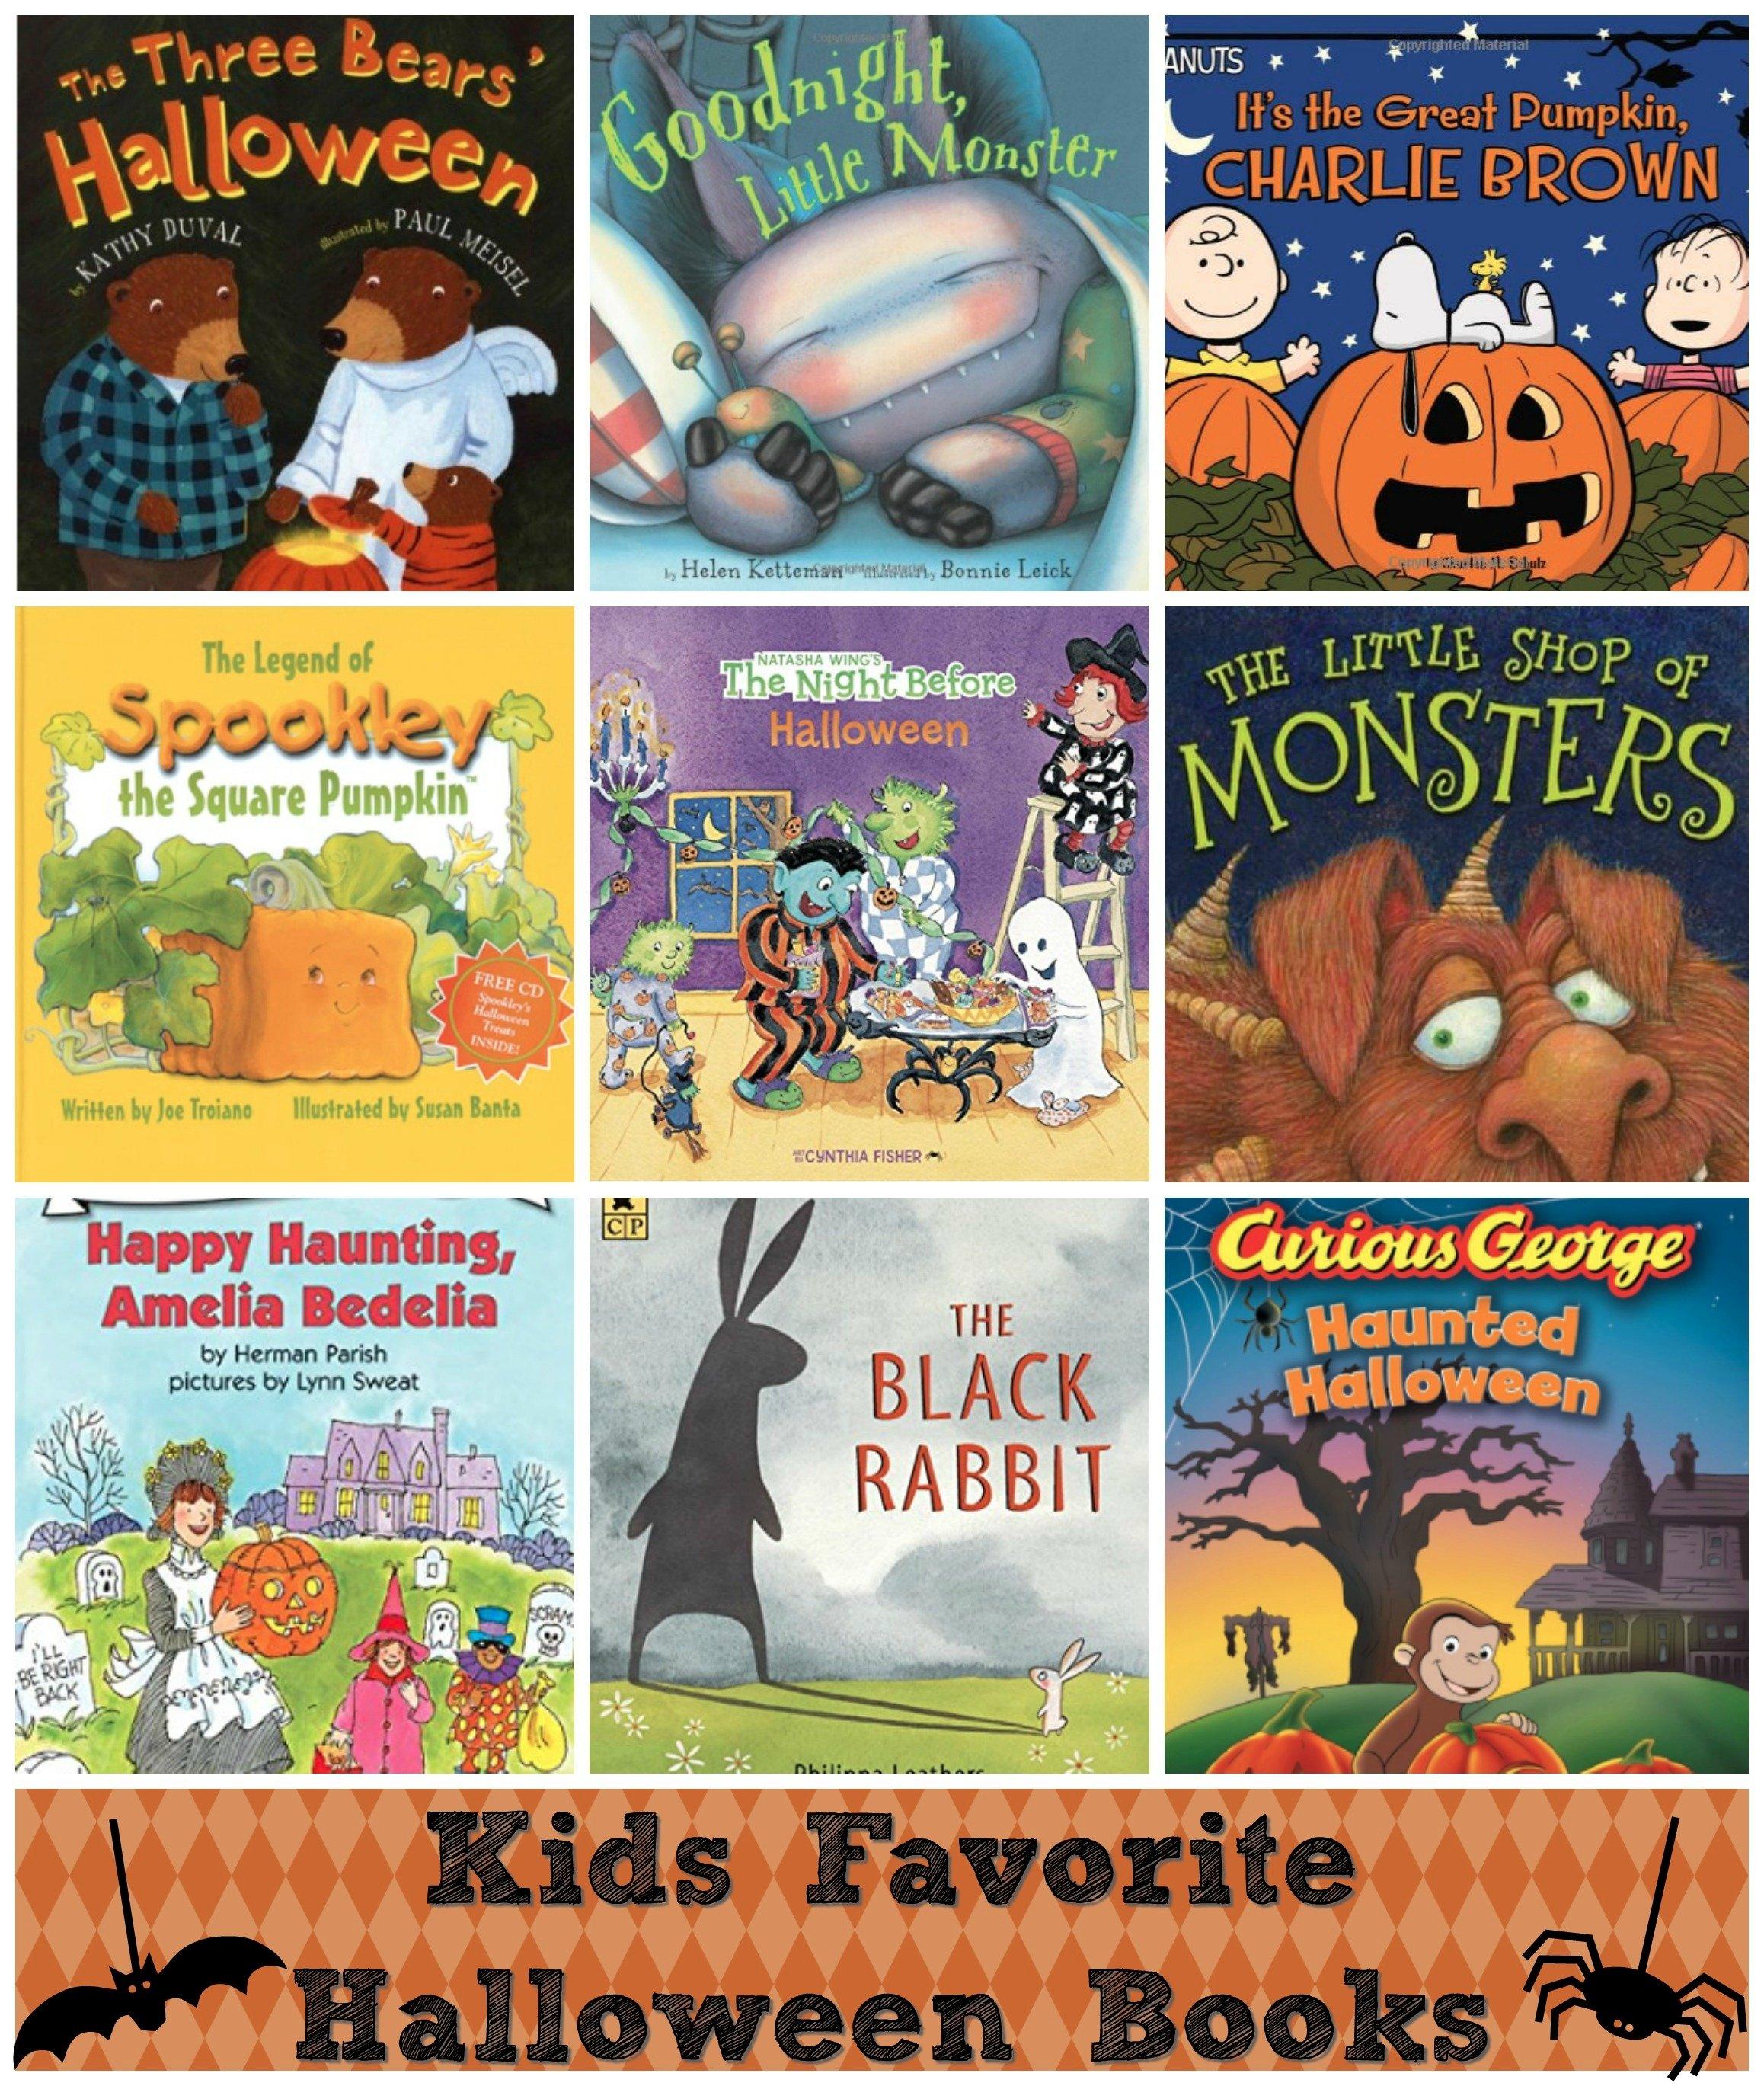 kids-favorite-halloween-books